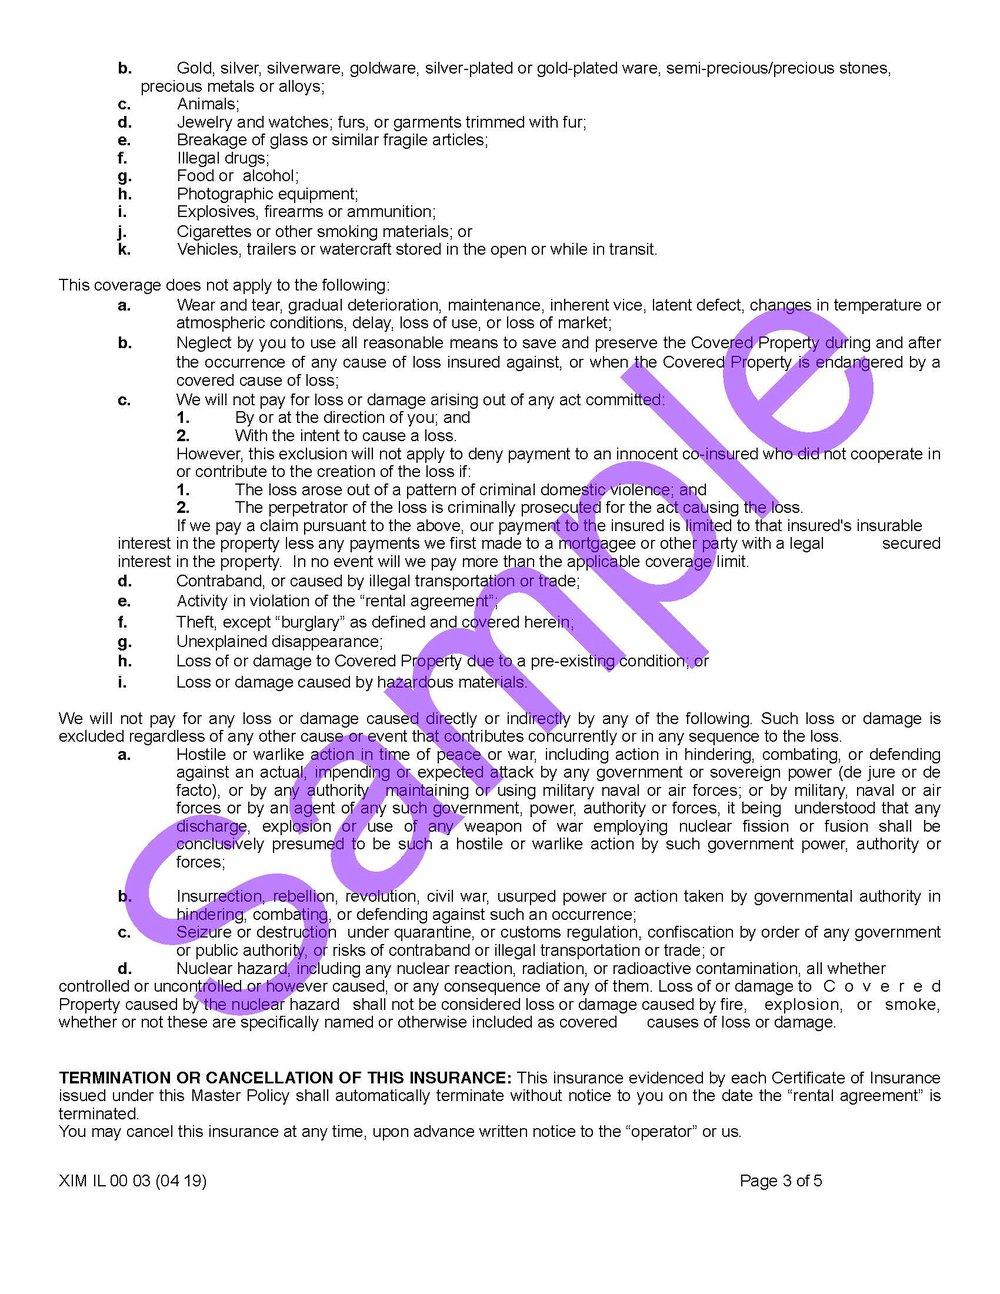 XIM IL 00 03 04 19 Illinois Certificate of InsuranceSample_Page_3.jpg